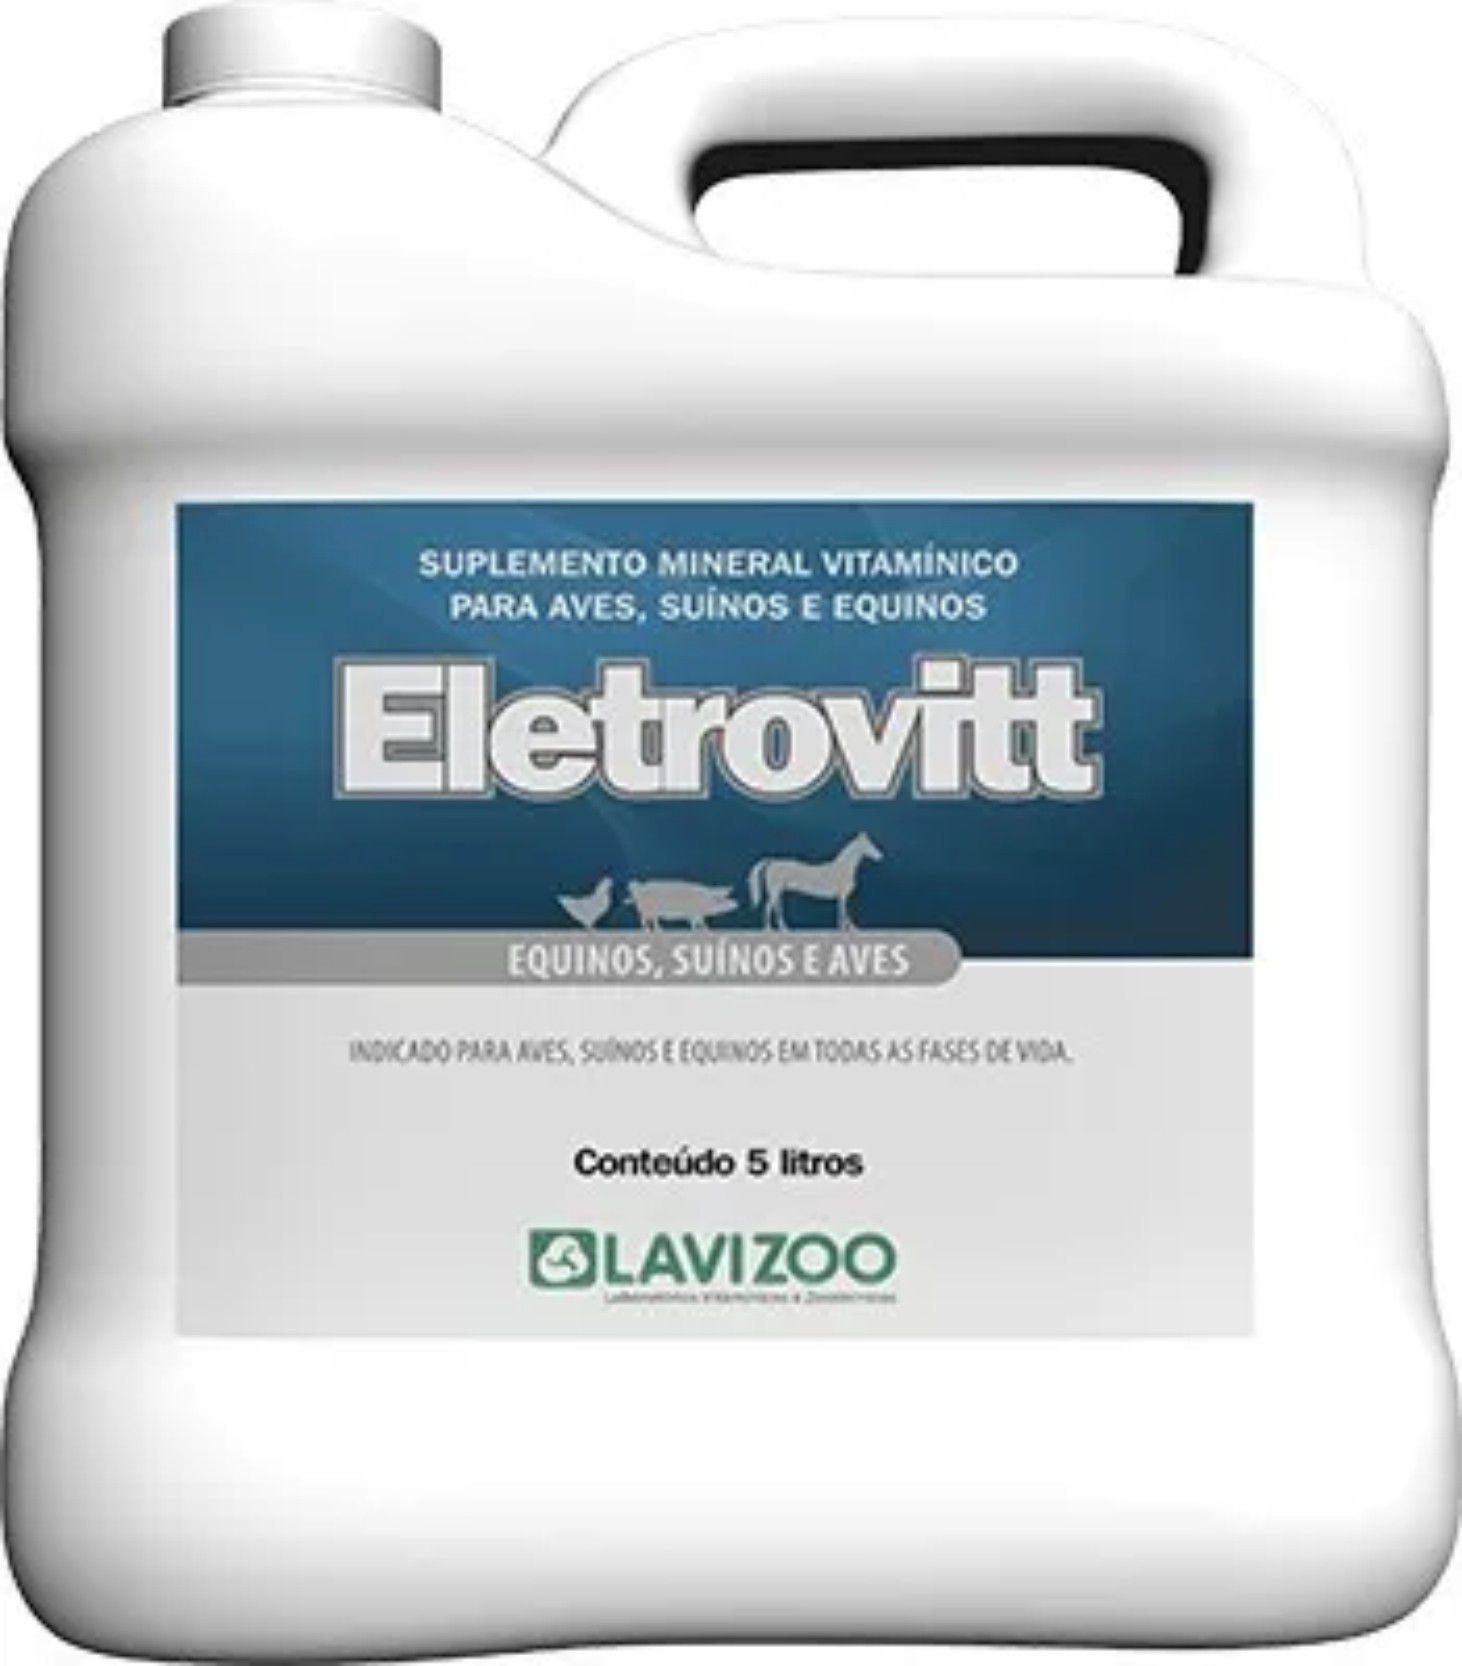 Eletrovitt Líquido - Vitaminas P/ Aves, Suínos e Equinos